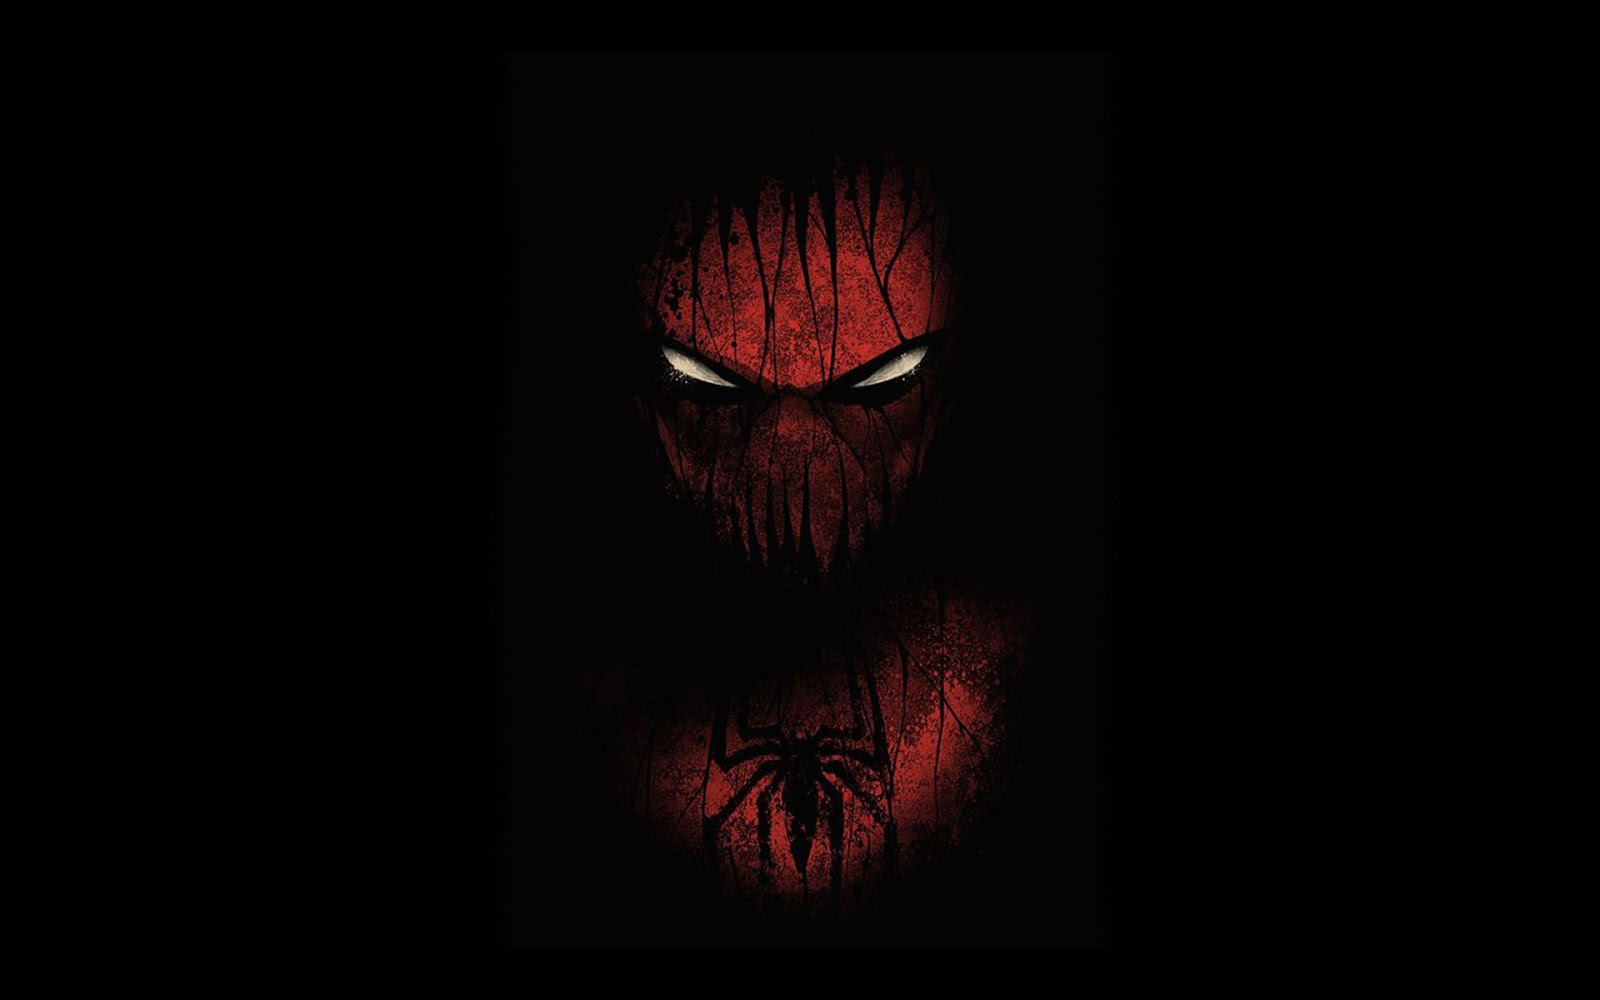 Man Comic Marvel Heroes Superhero Black Dark Background HD Wallpaper 1600x1000